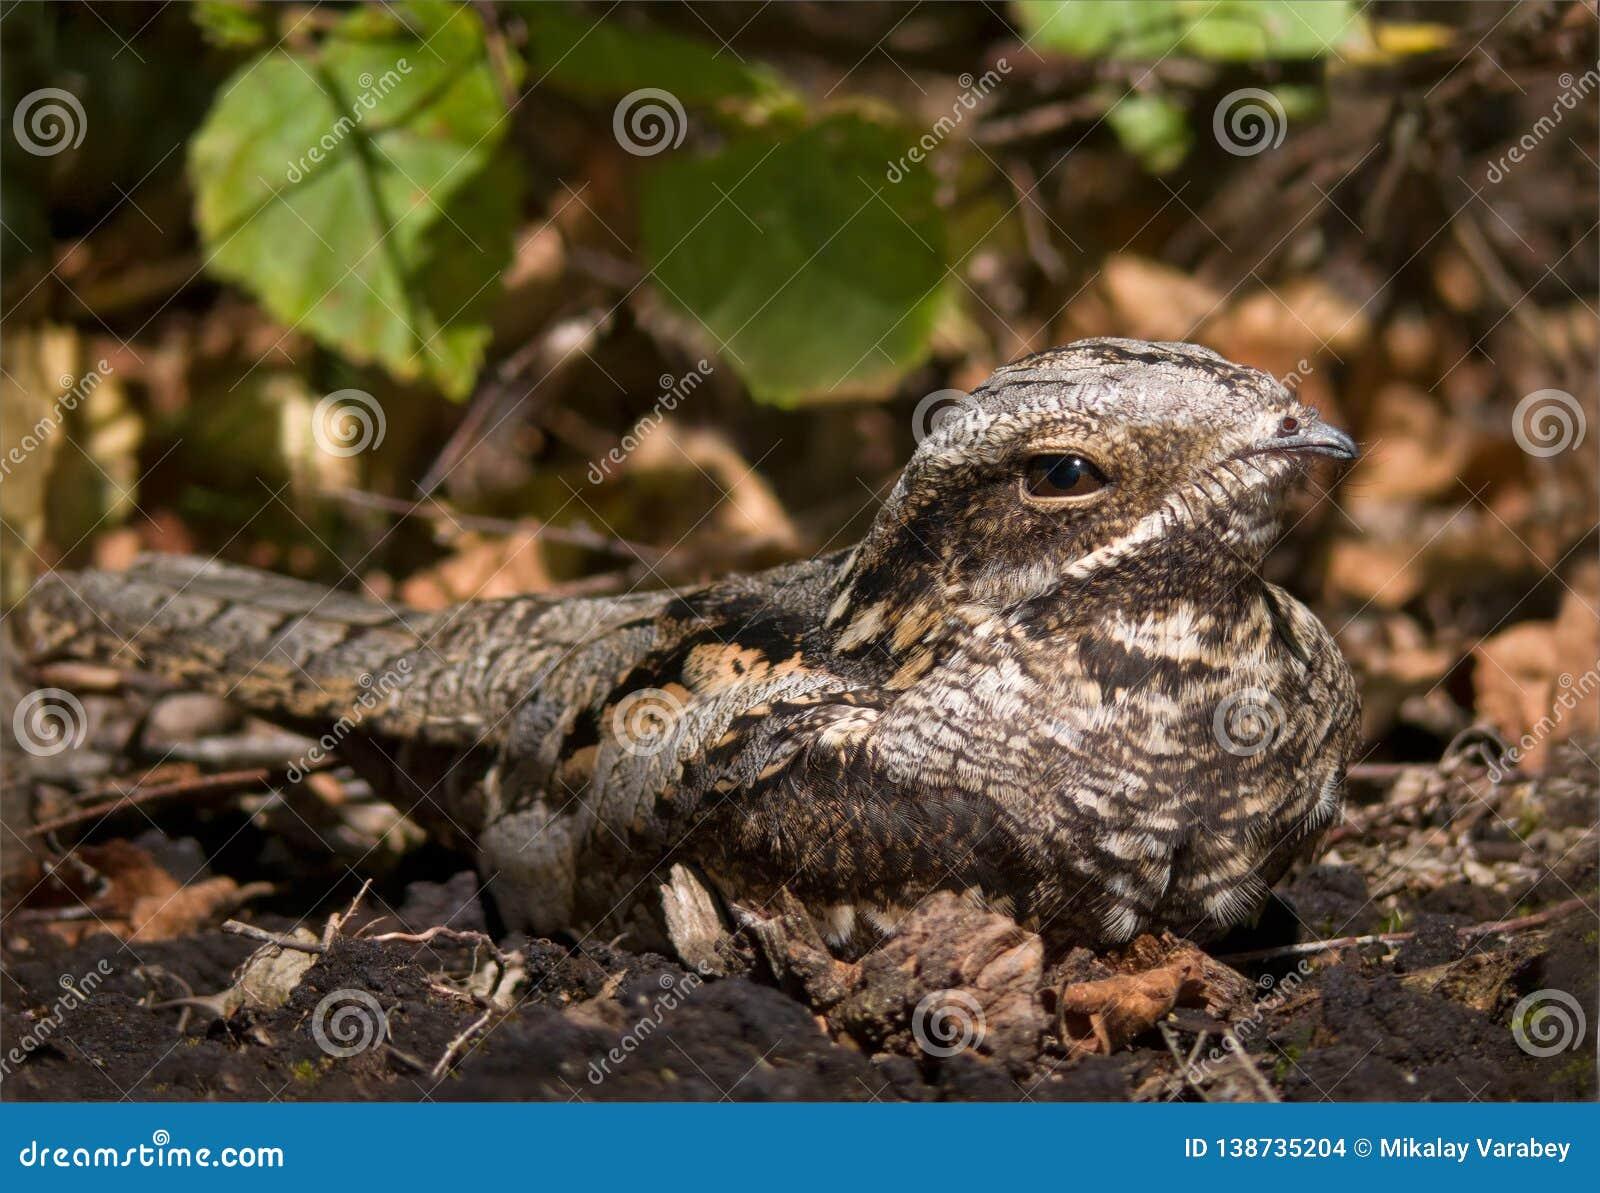 European nightjar sit on the ground with leaves